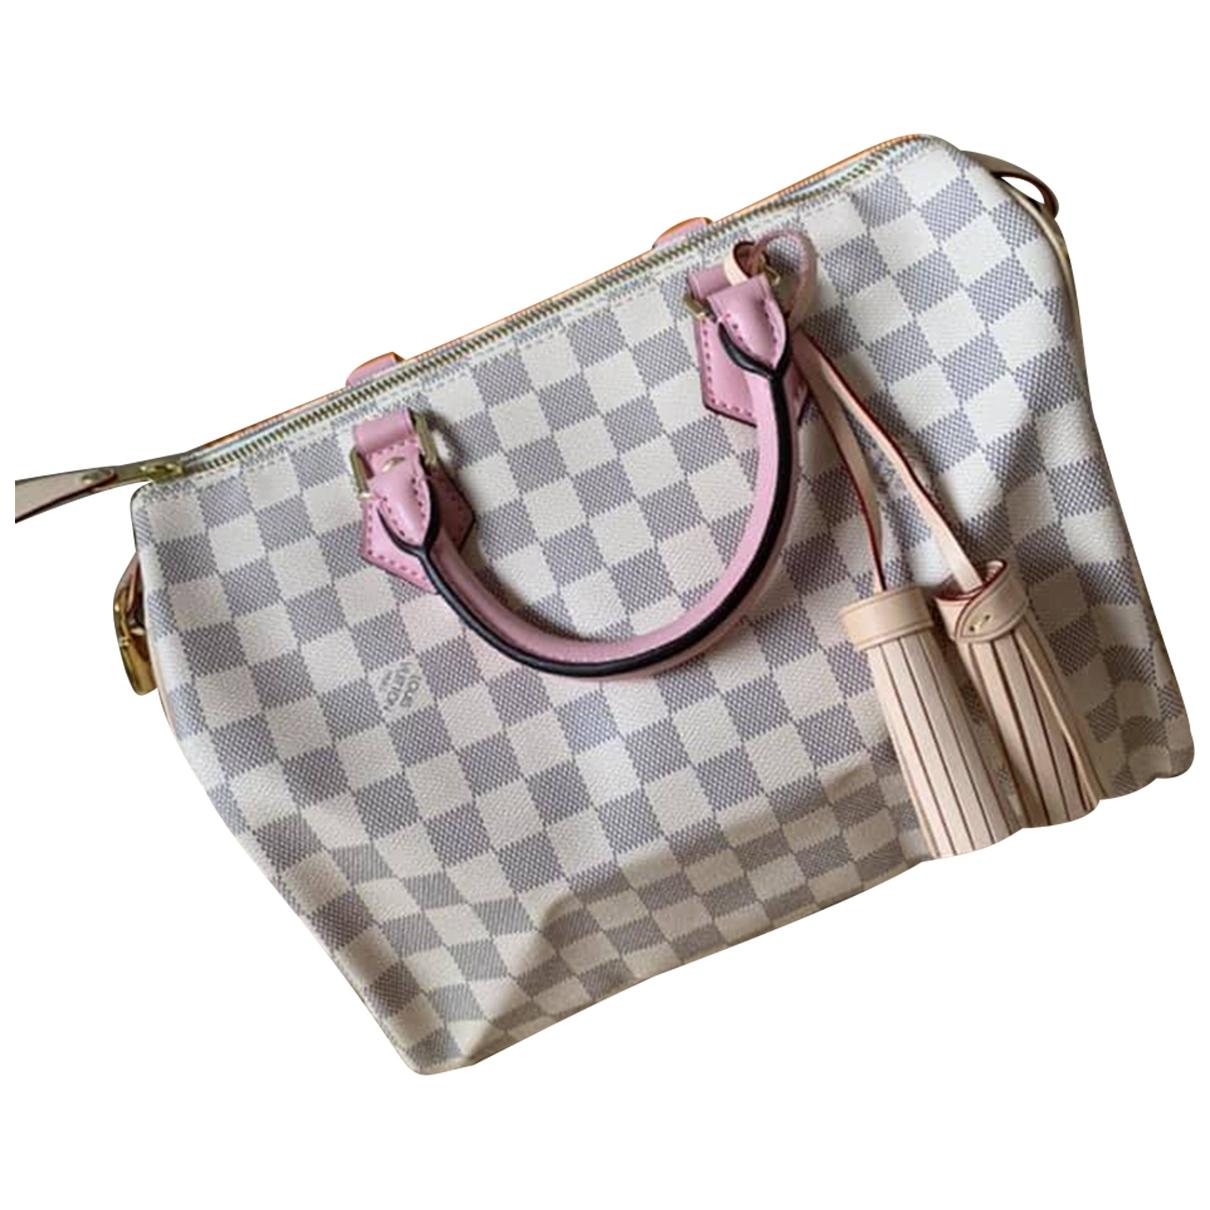 Louis Vuitton Speedy Bandoulière Ecru Cloth handbag for Women \N